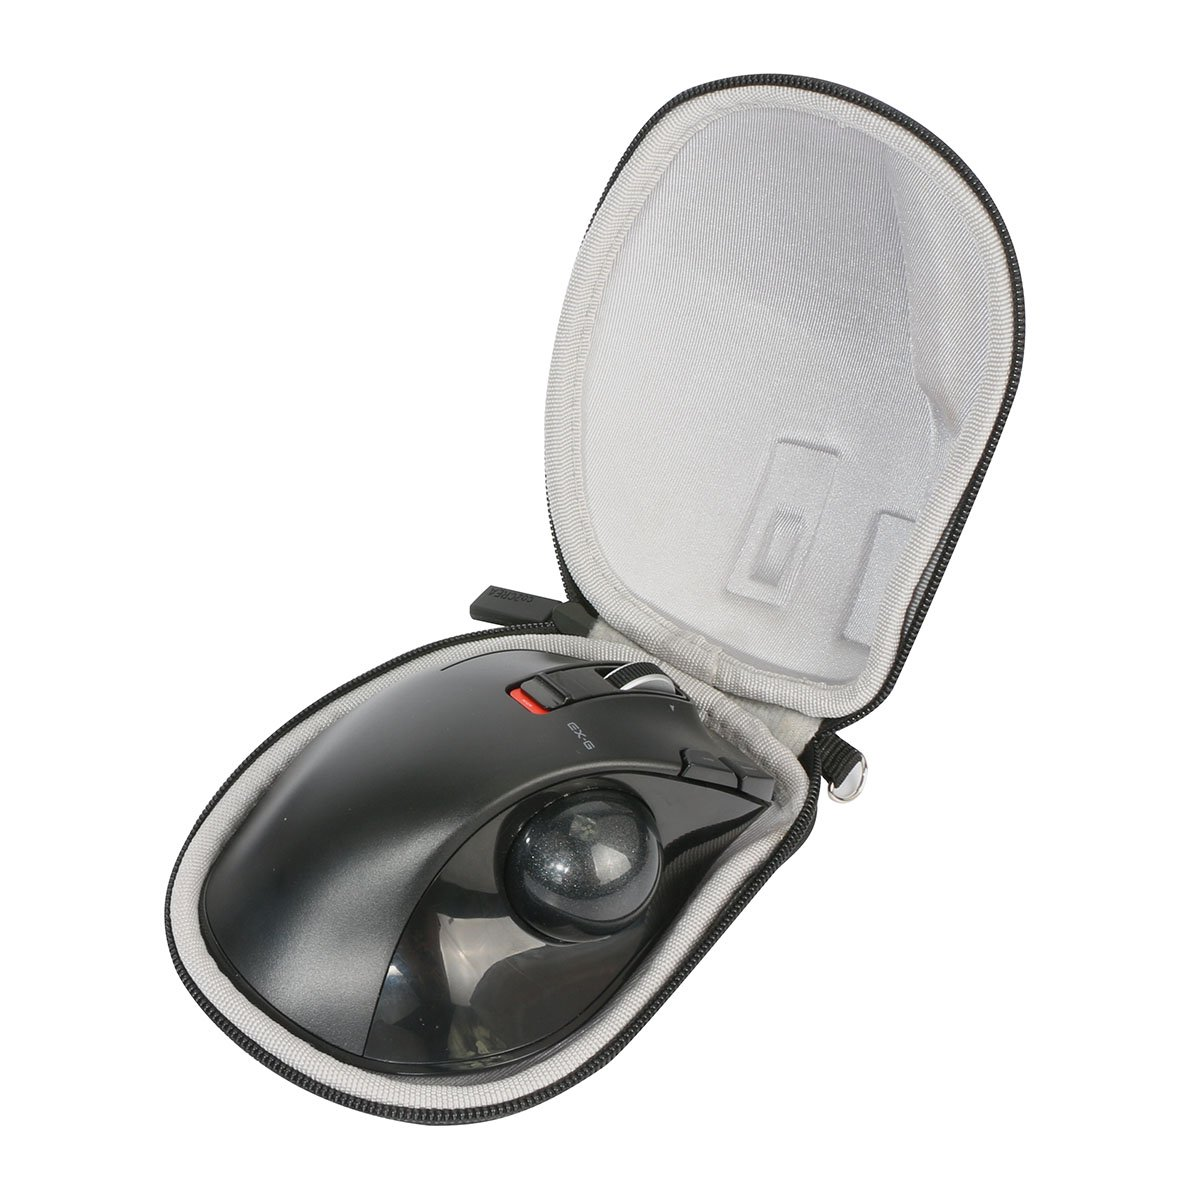 Hard Travel Case for ELECOM Wireless Trackball Left-Handed Mouse M-XT4DRBK by co2CREA